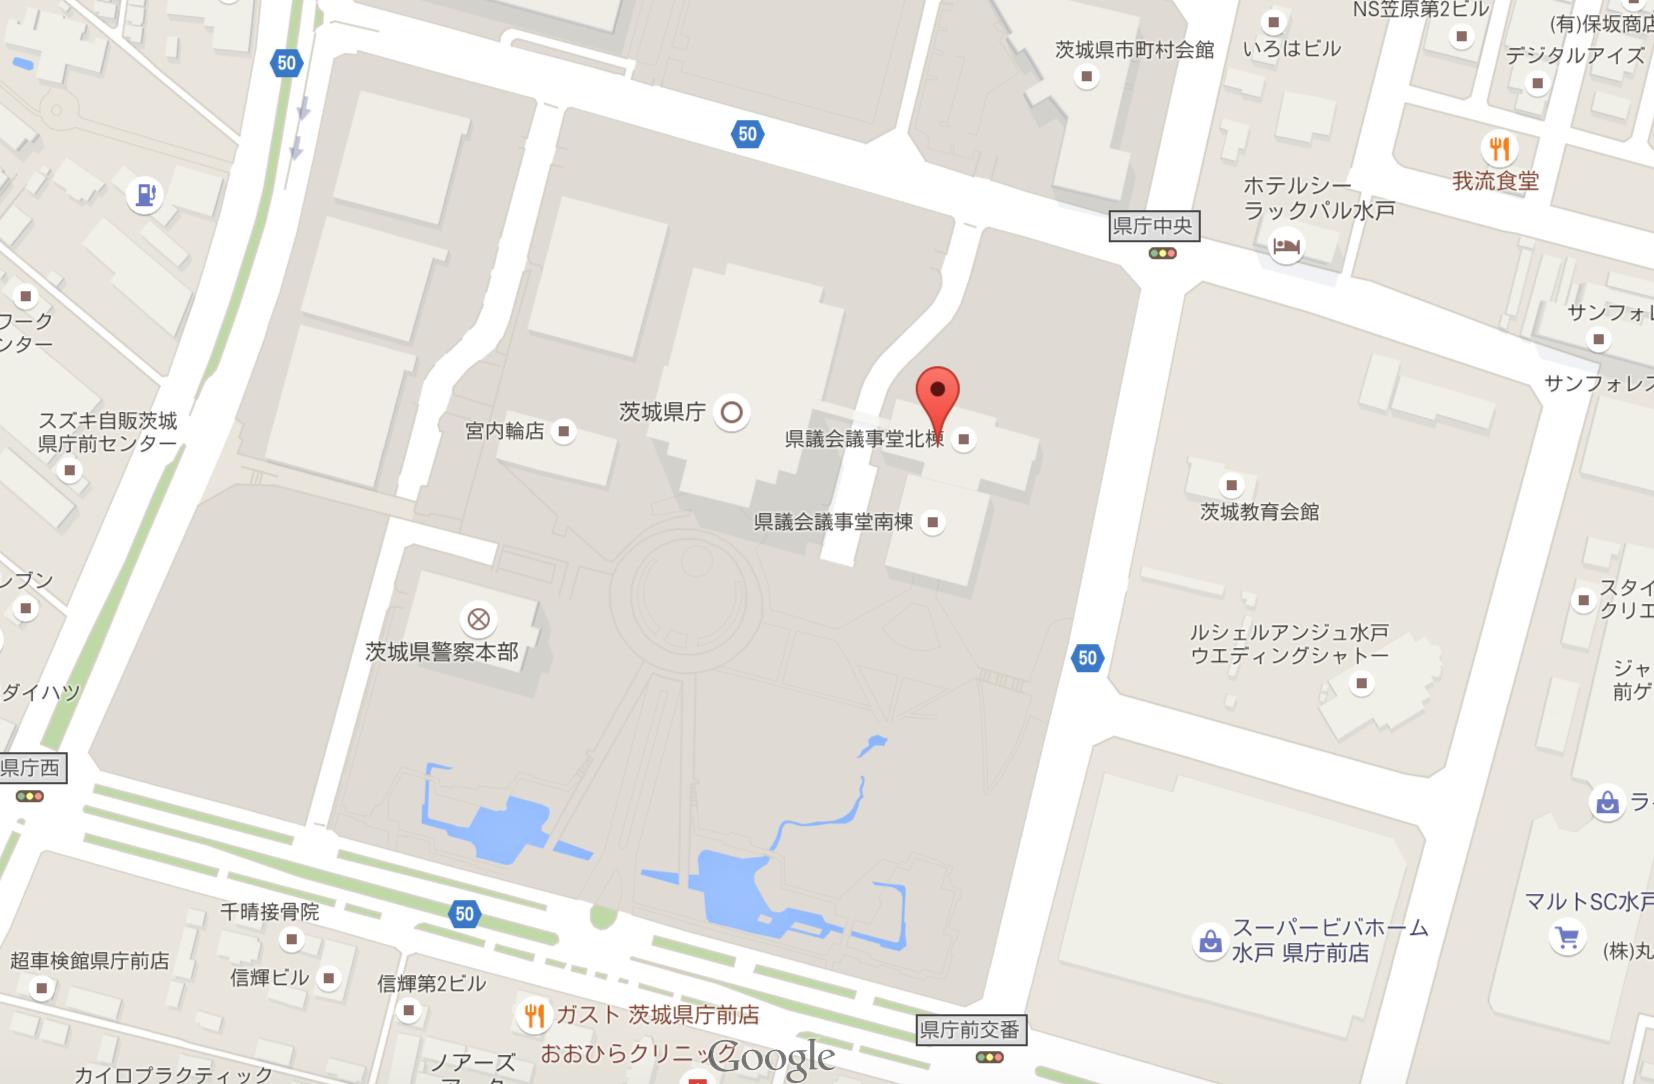 (出典:Googlemap)